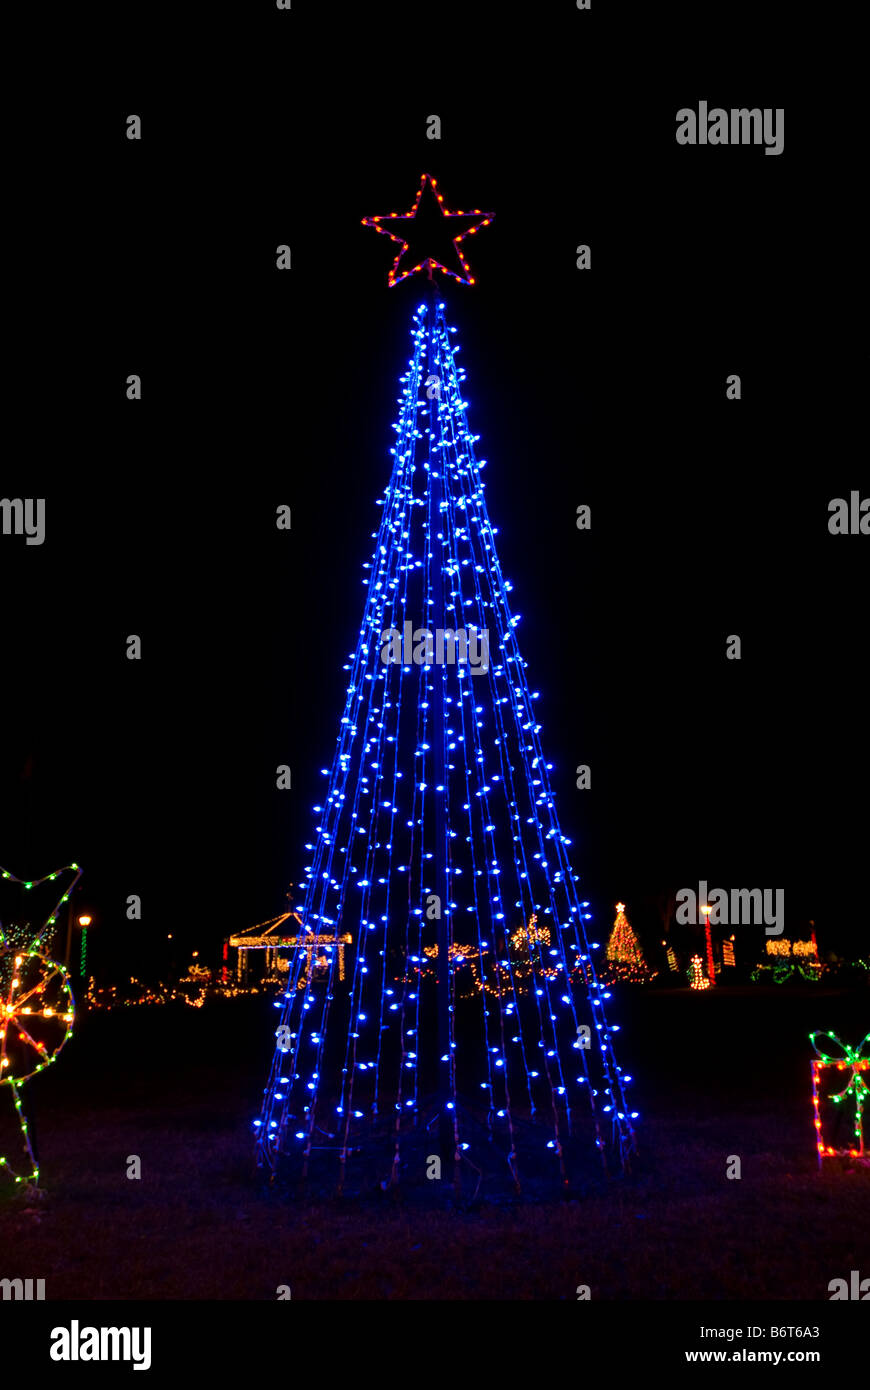 Christmas tree bright blue color lights night dark background christmas decorations decor dark background - Stock Image